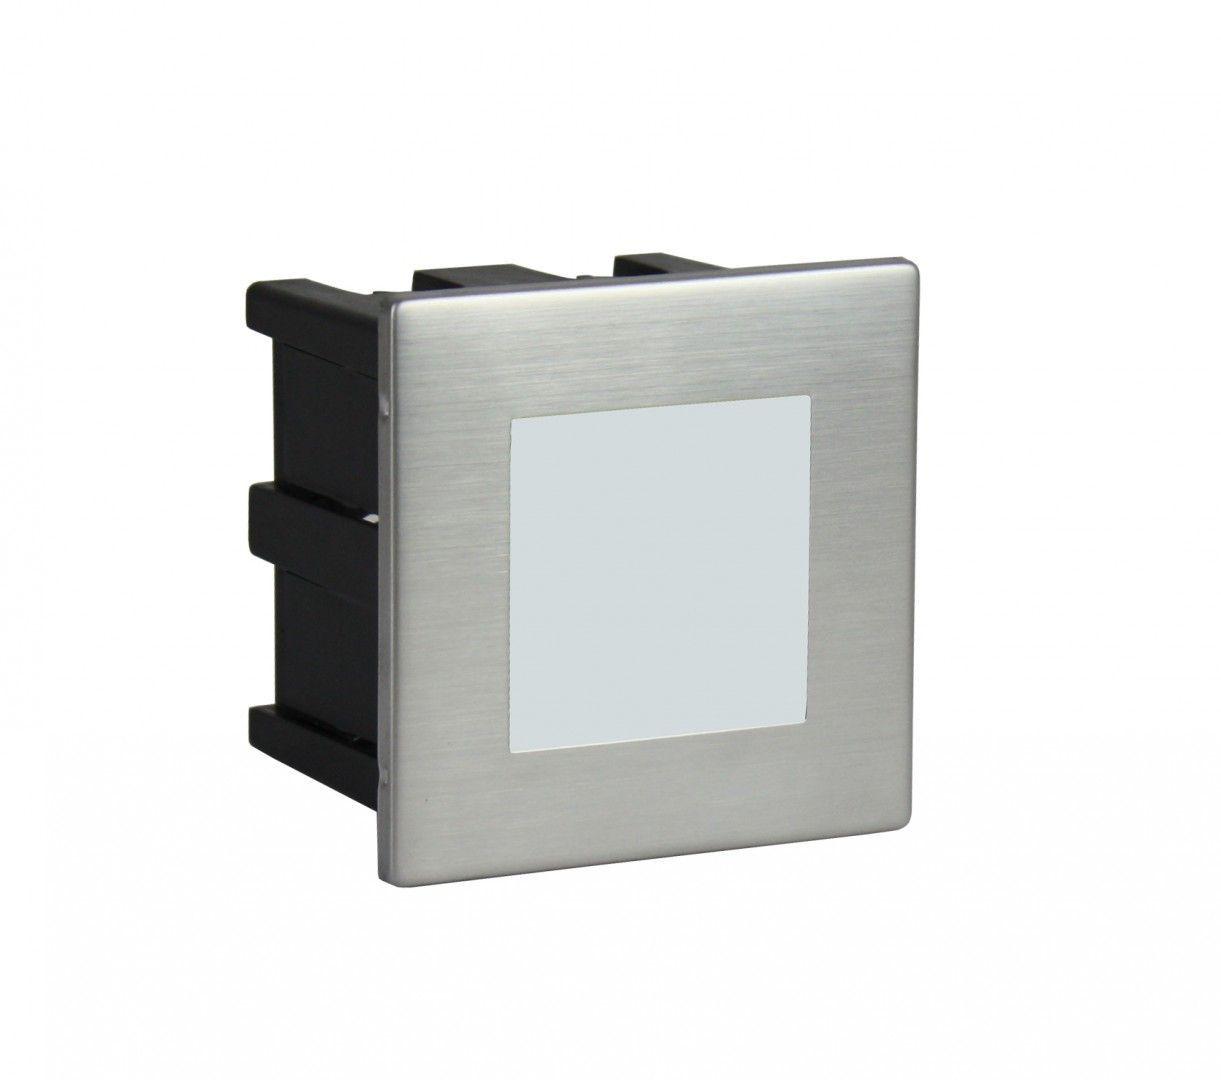 SU-MA Mur Led Inox F 04 oprawa do wbudowania LED 1,5W IP65